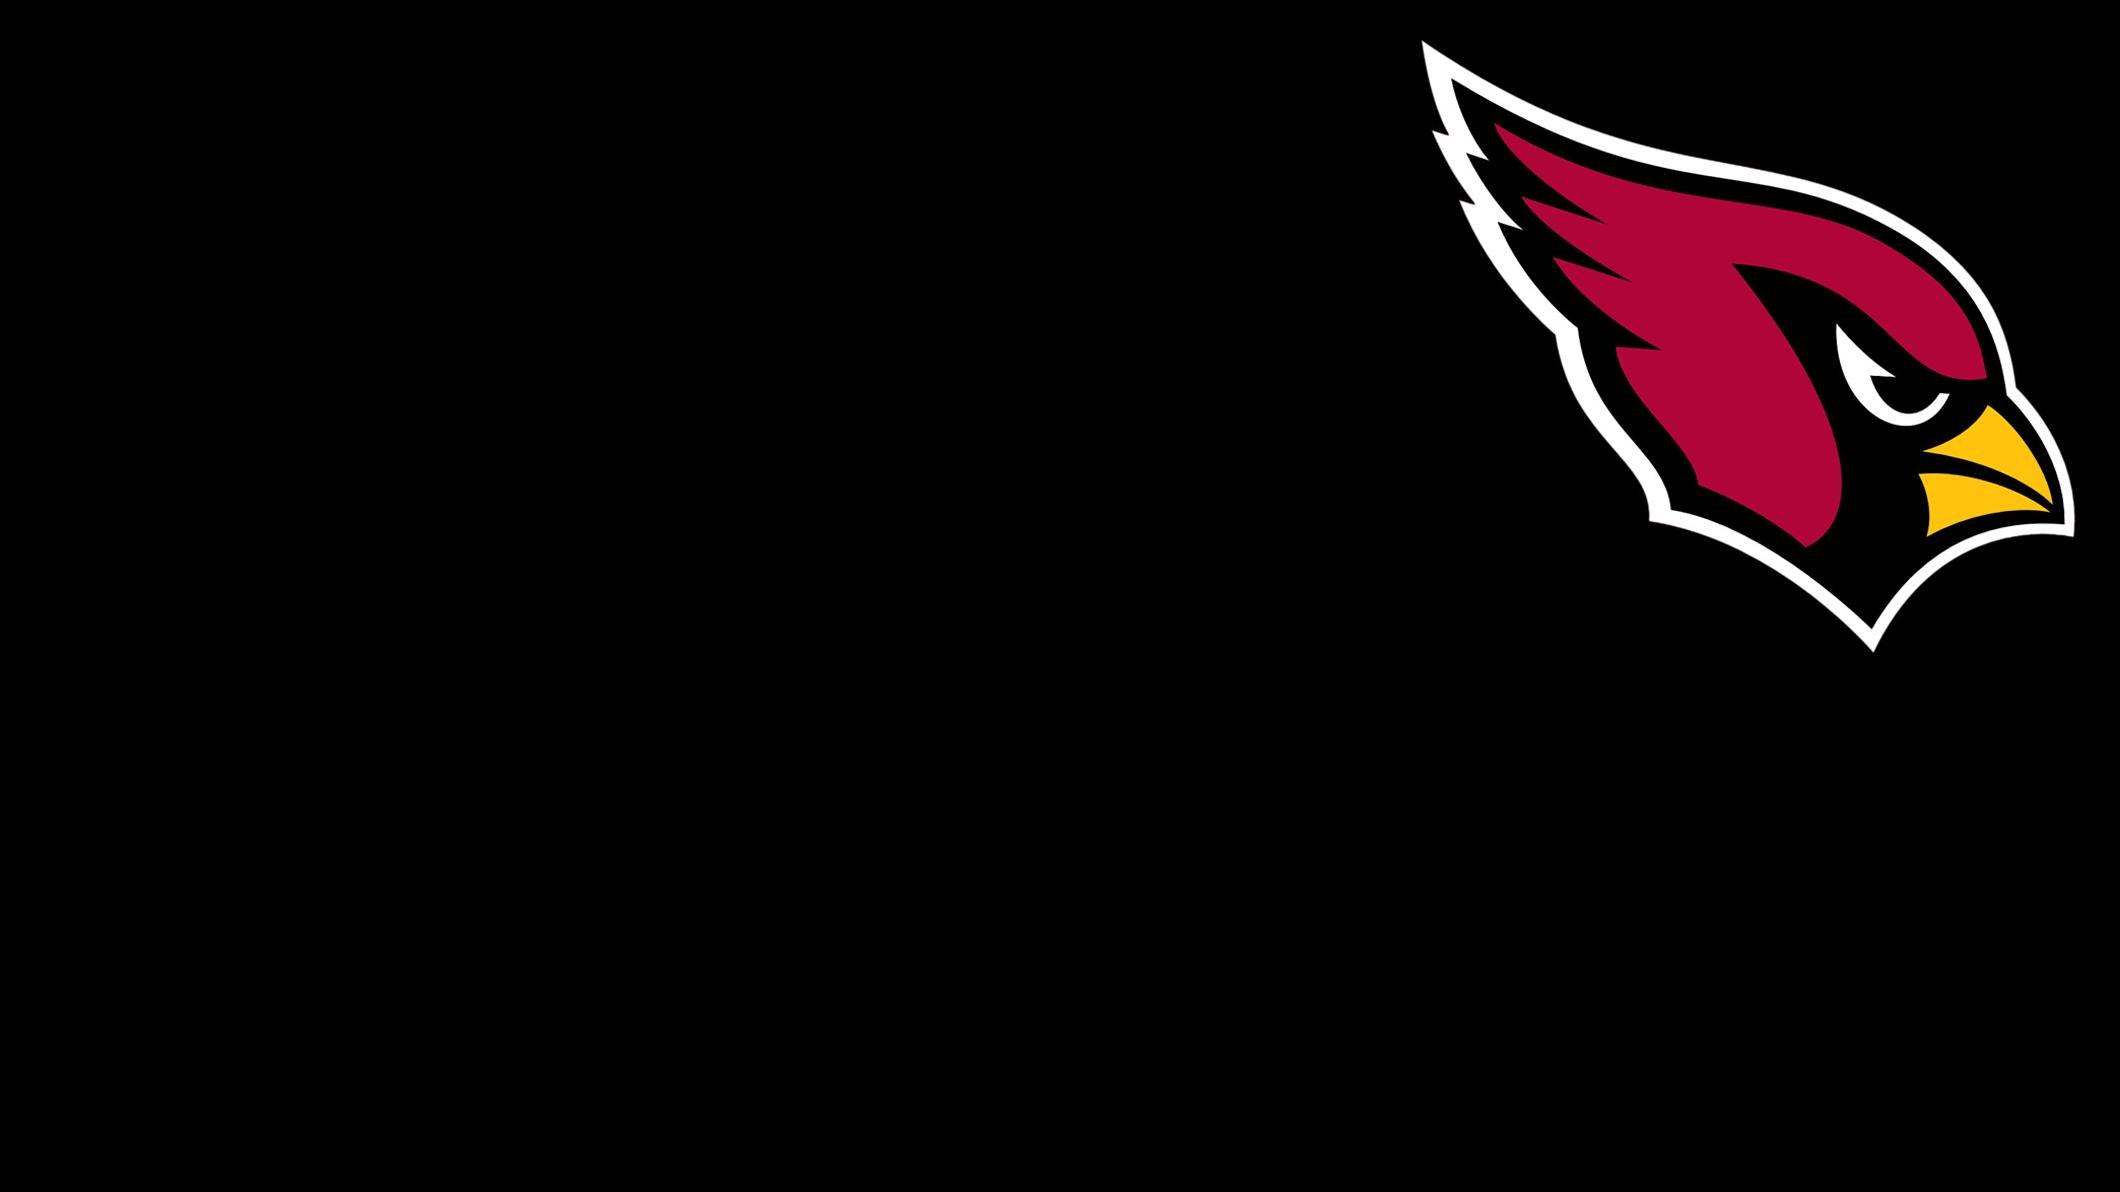 Arizona Cardinals Logo 7 Wallpaper, Download Free Arizona